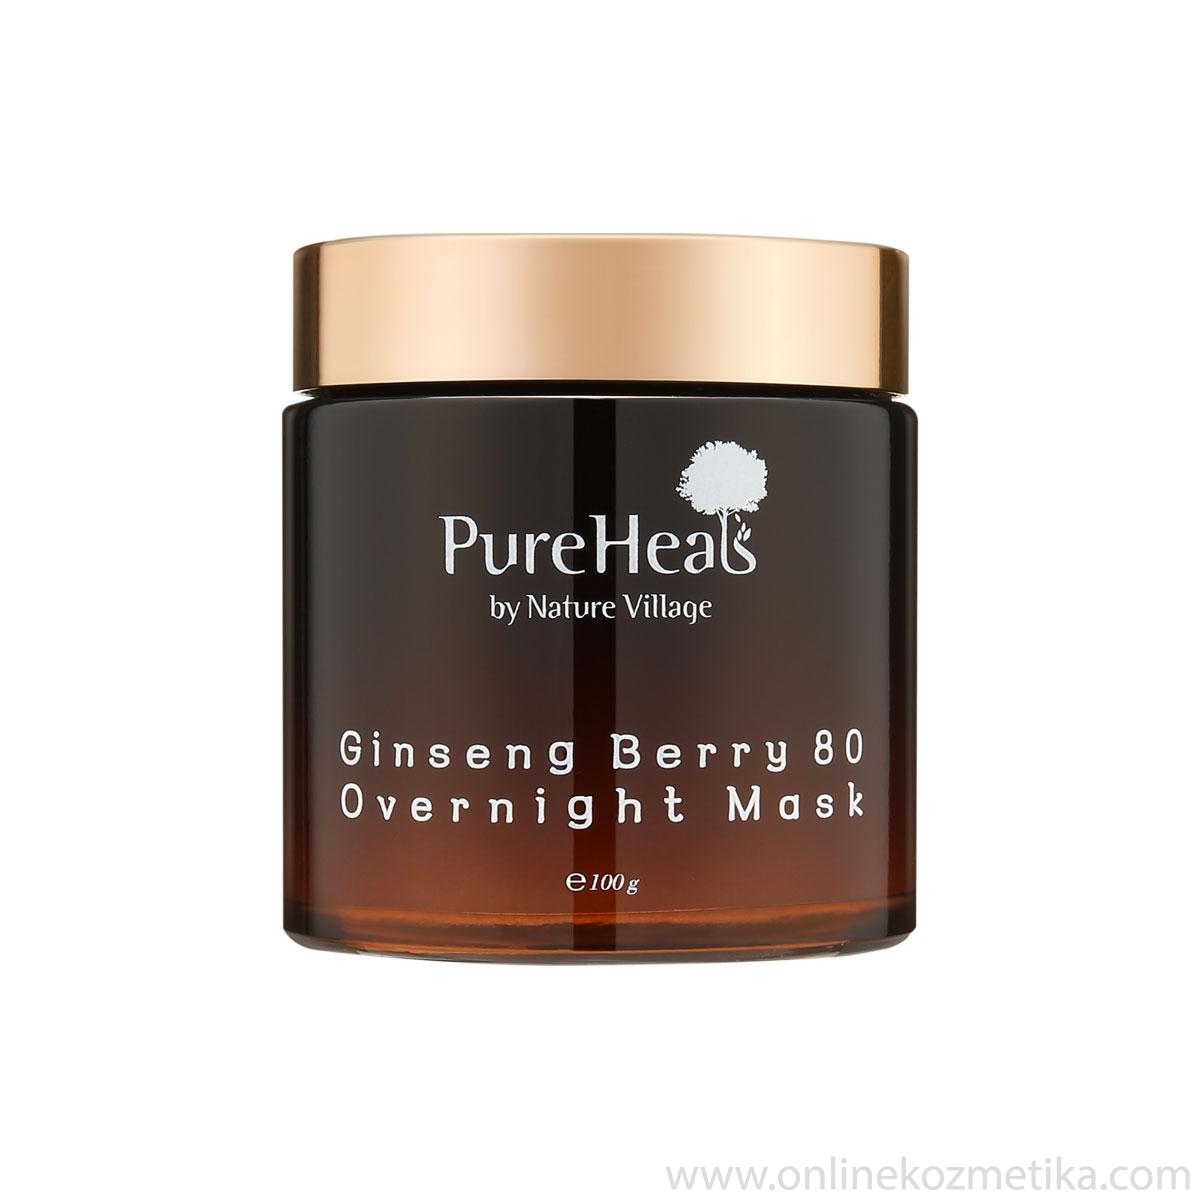 Pureheals Ginseng Berry 80 Overnight Mask 100ml